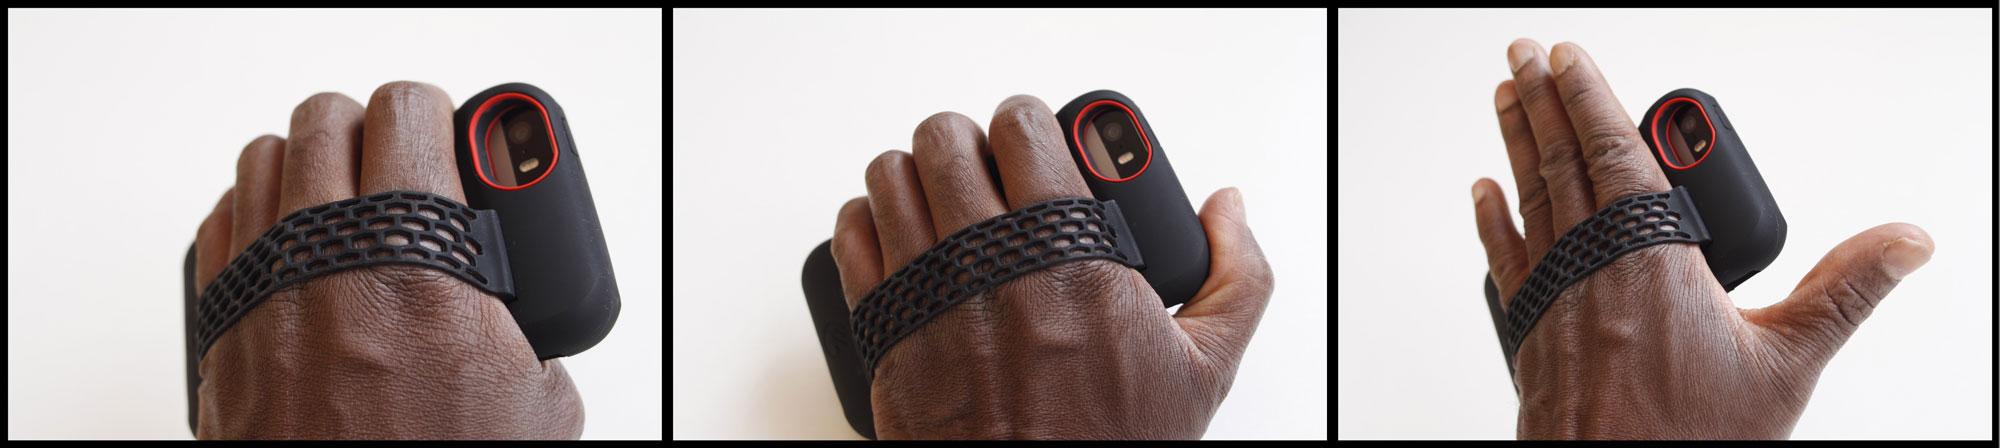 Etui de protection running yurbuds Race Case pour iPhone 5/5S, Ph. Moctar KANE